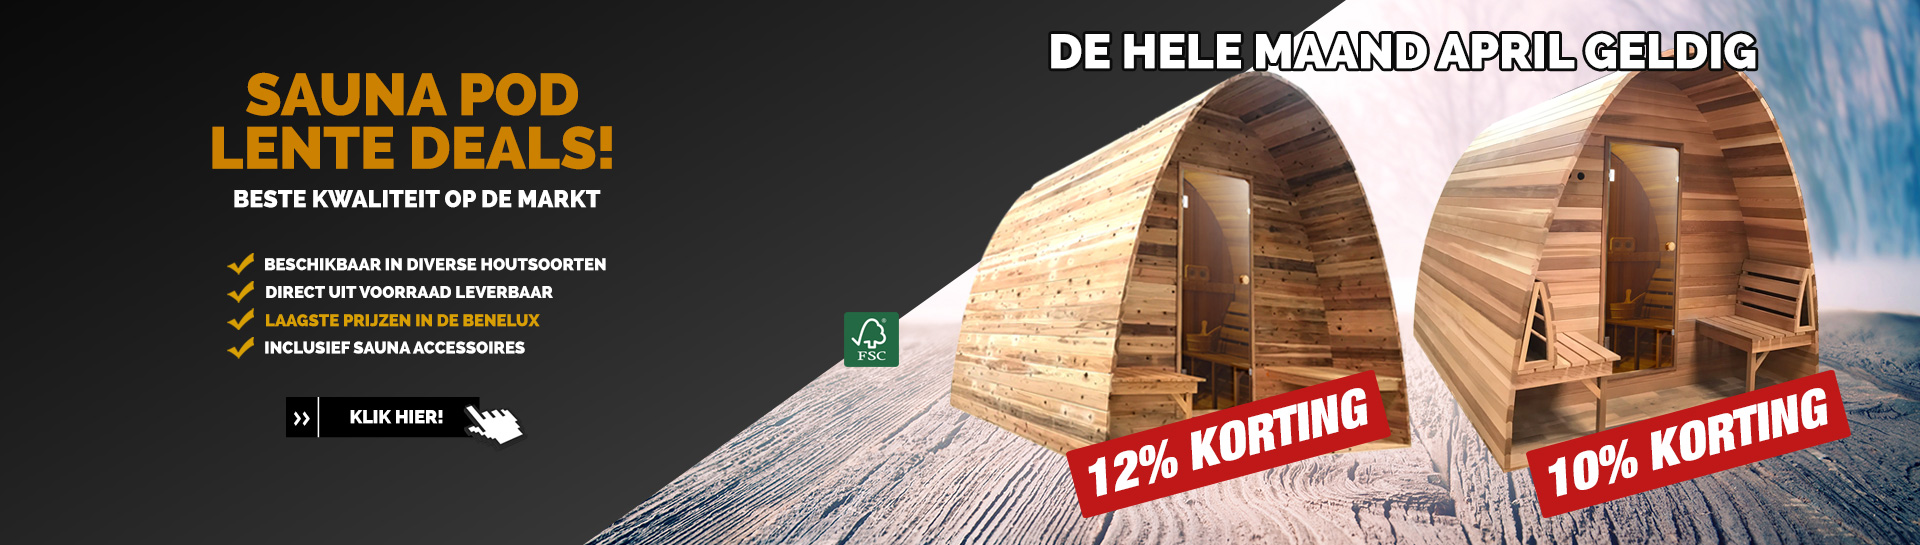 Sauna pod April actie